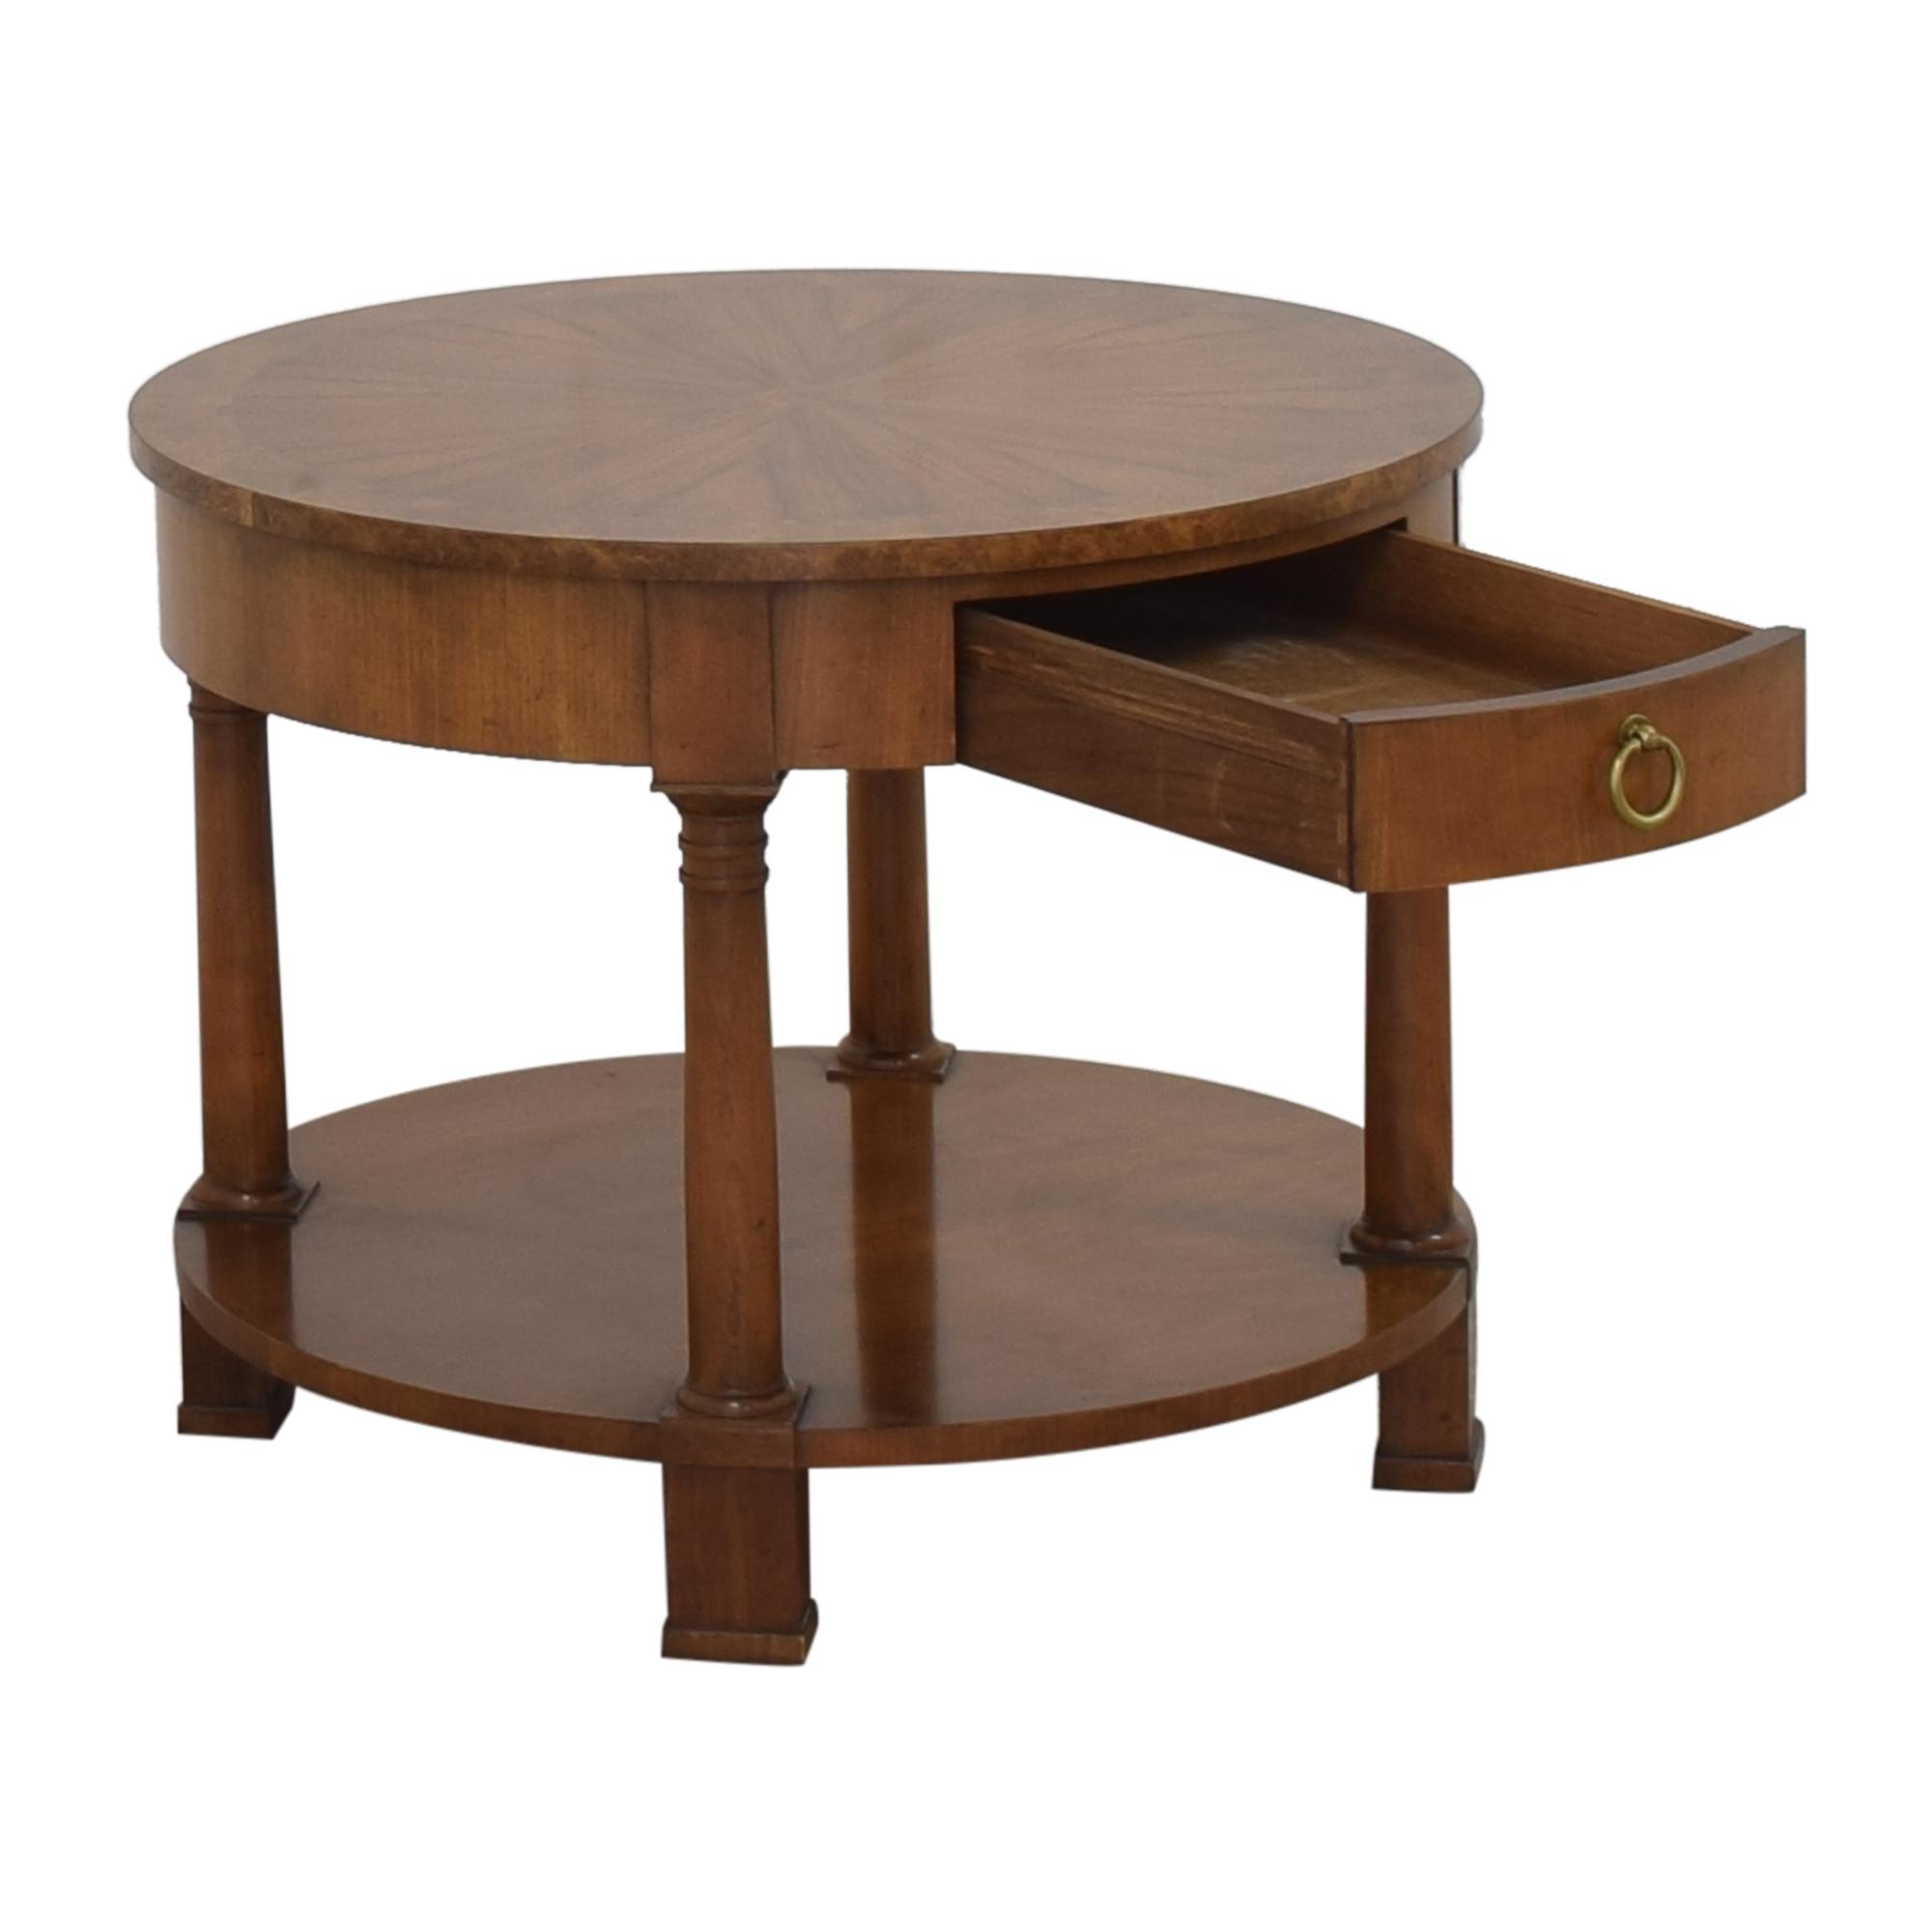 Baker Furniture Baker Furniture Round End Table ct